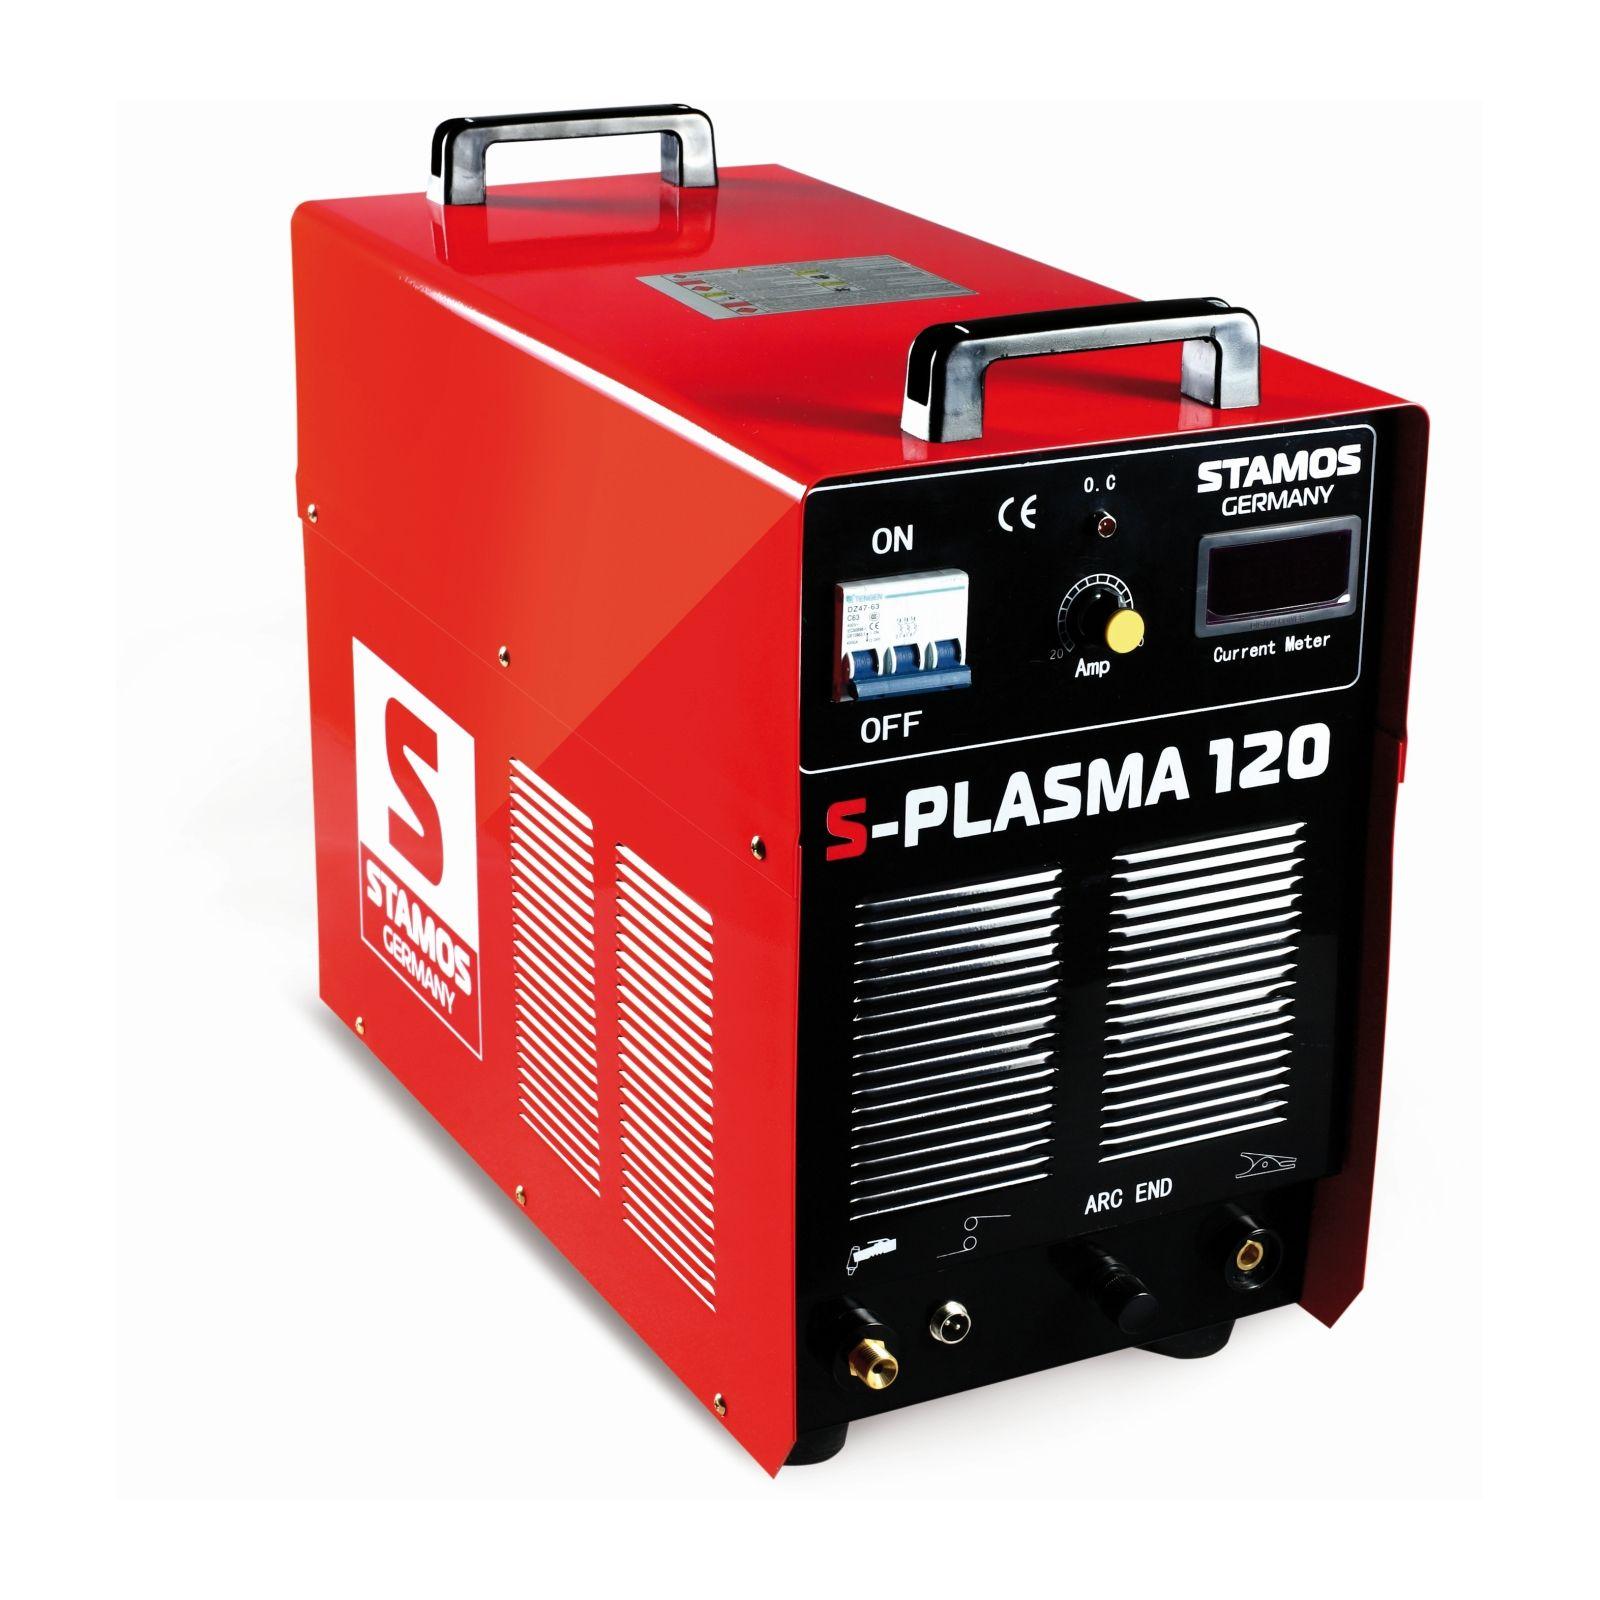 Stamos Basic Plasma cutter - 120 A - 400 V - Pilot ignition